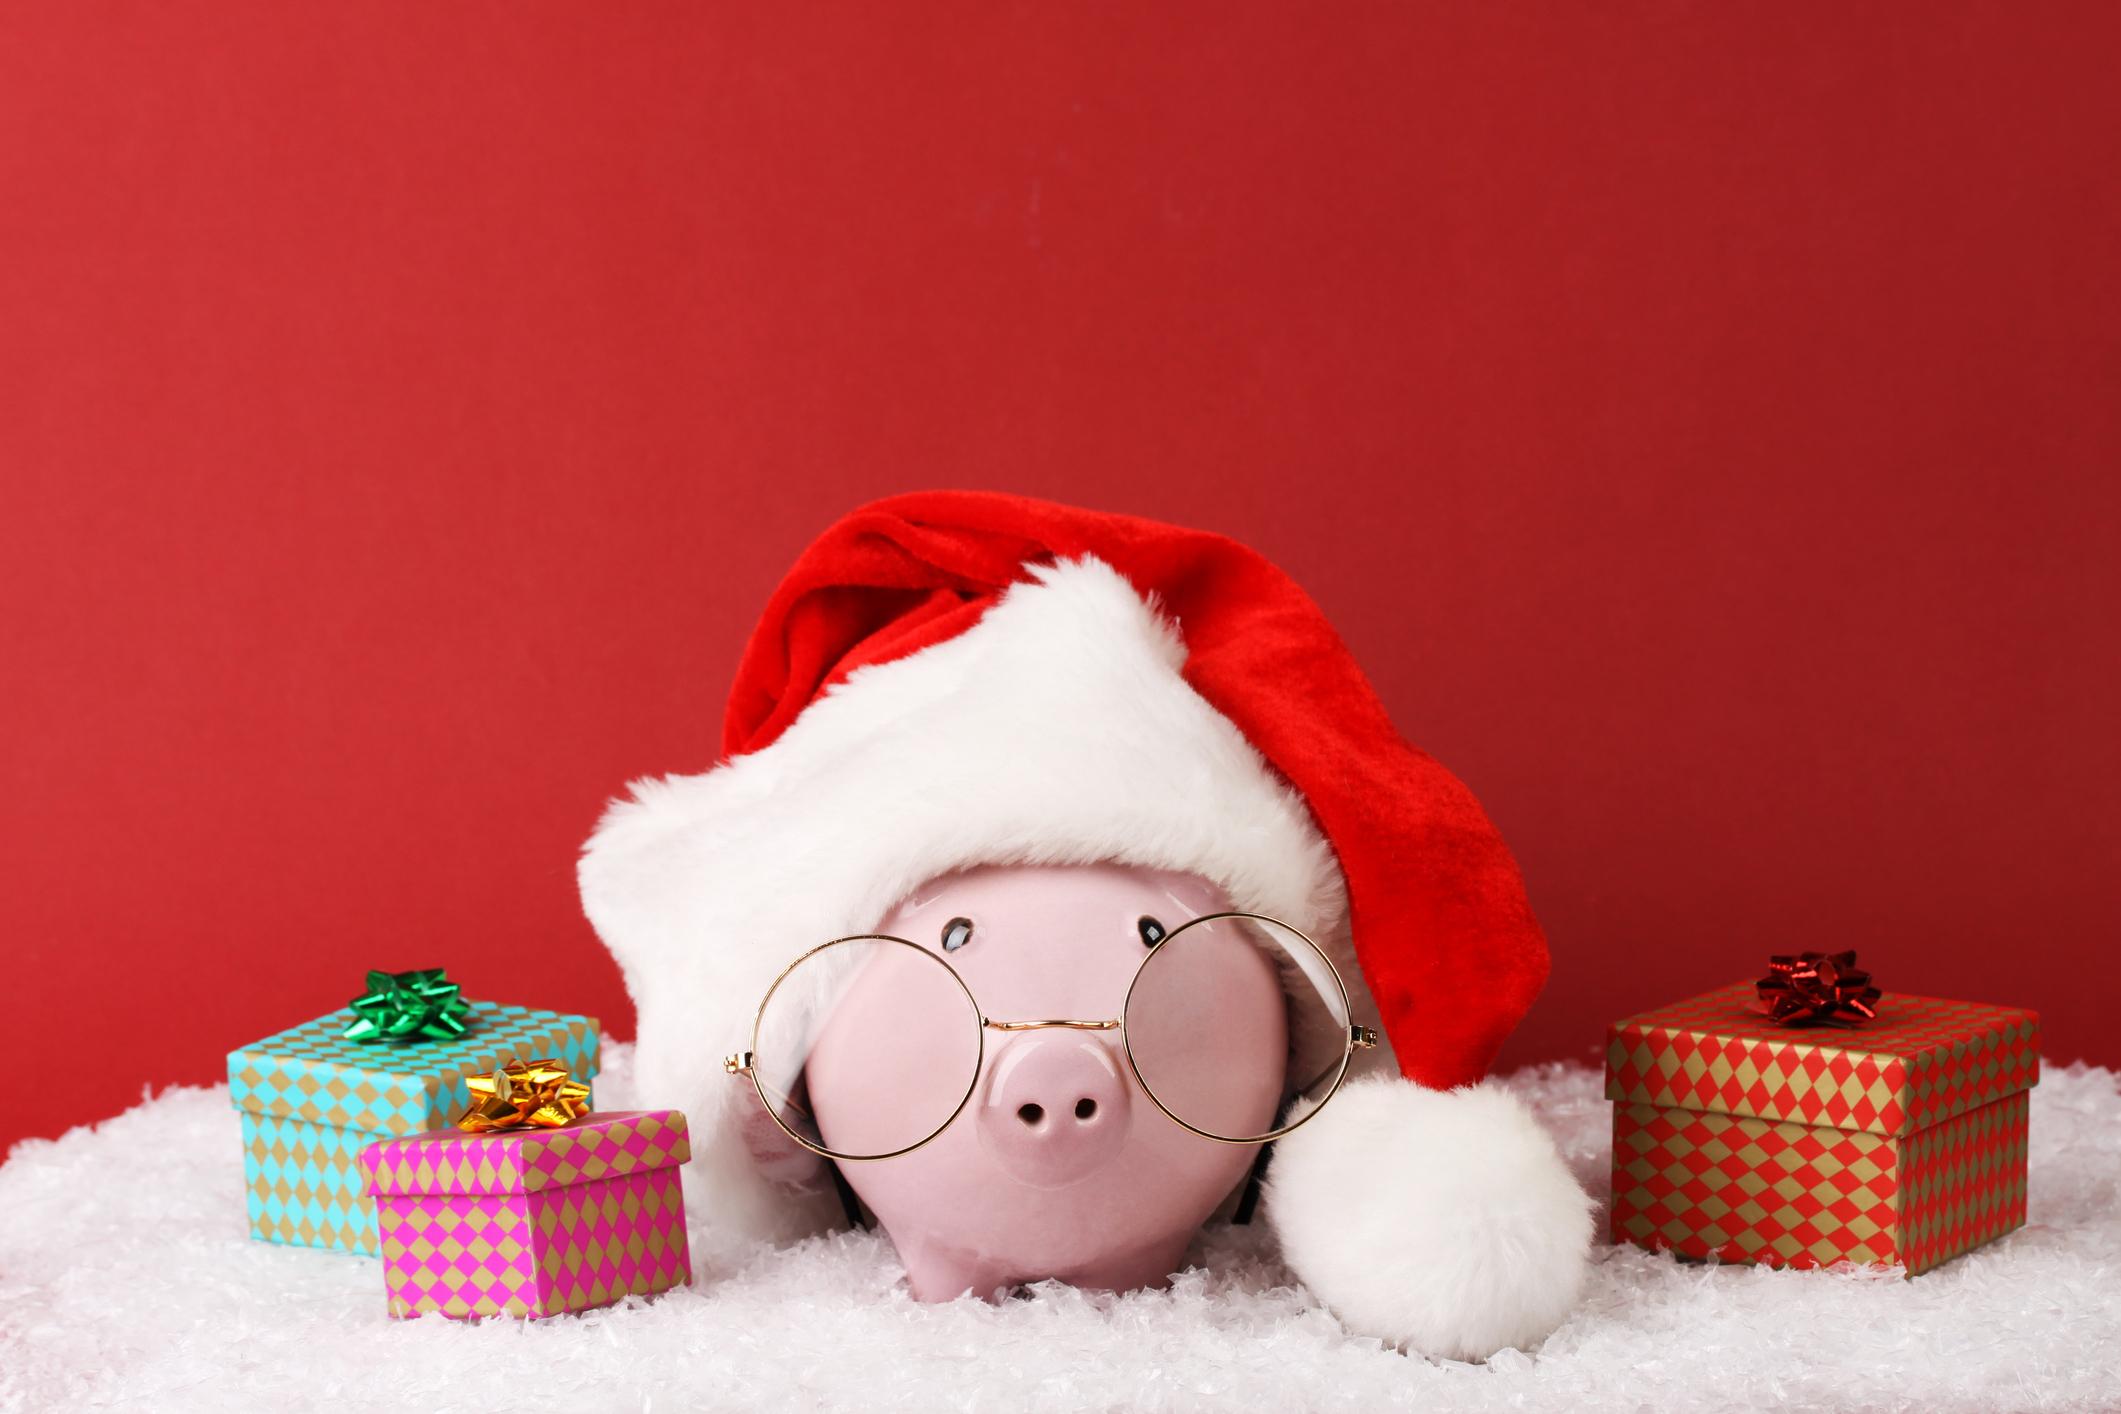 A piggy bank is wearing a Santa hat.